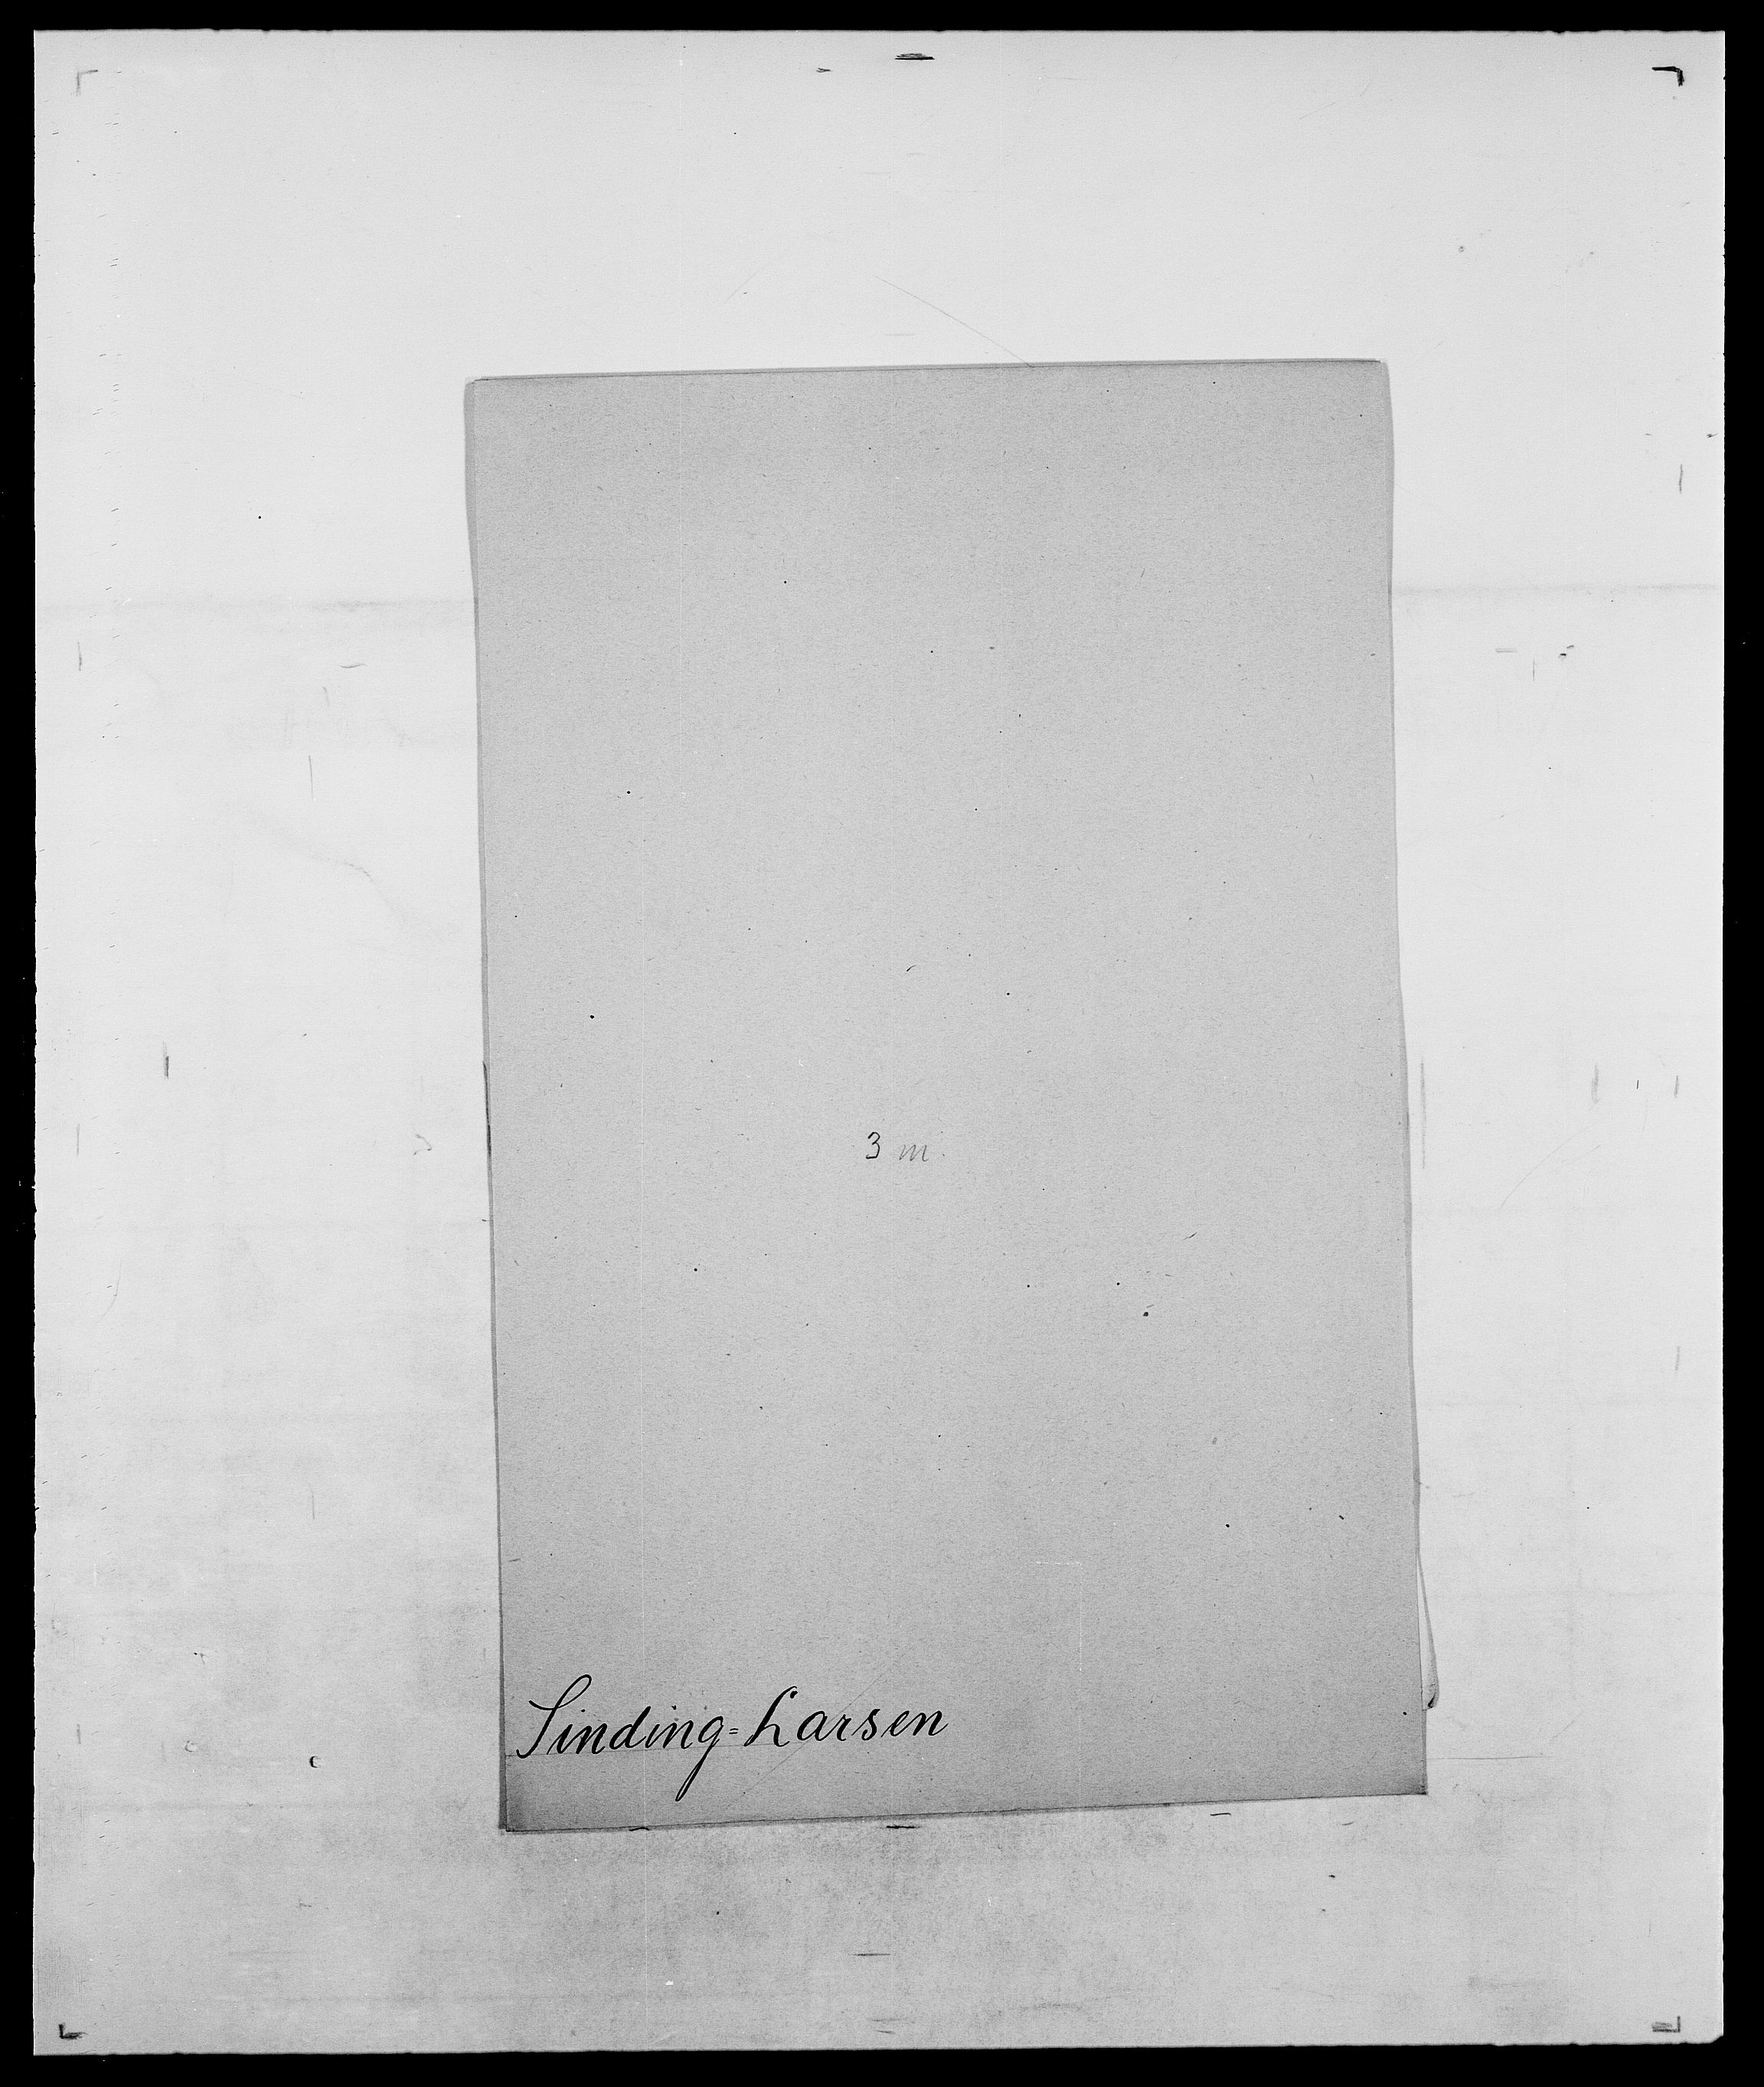 SAO, Delgobe, Charles Antoine - samling, D/Da/L0035: Schnabel - sjetman, s. 926